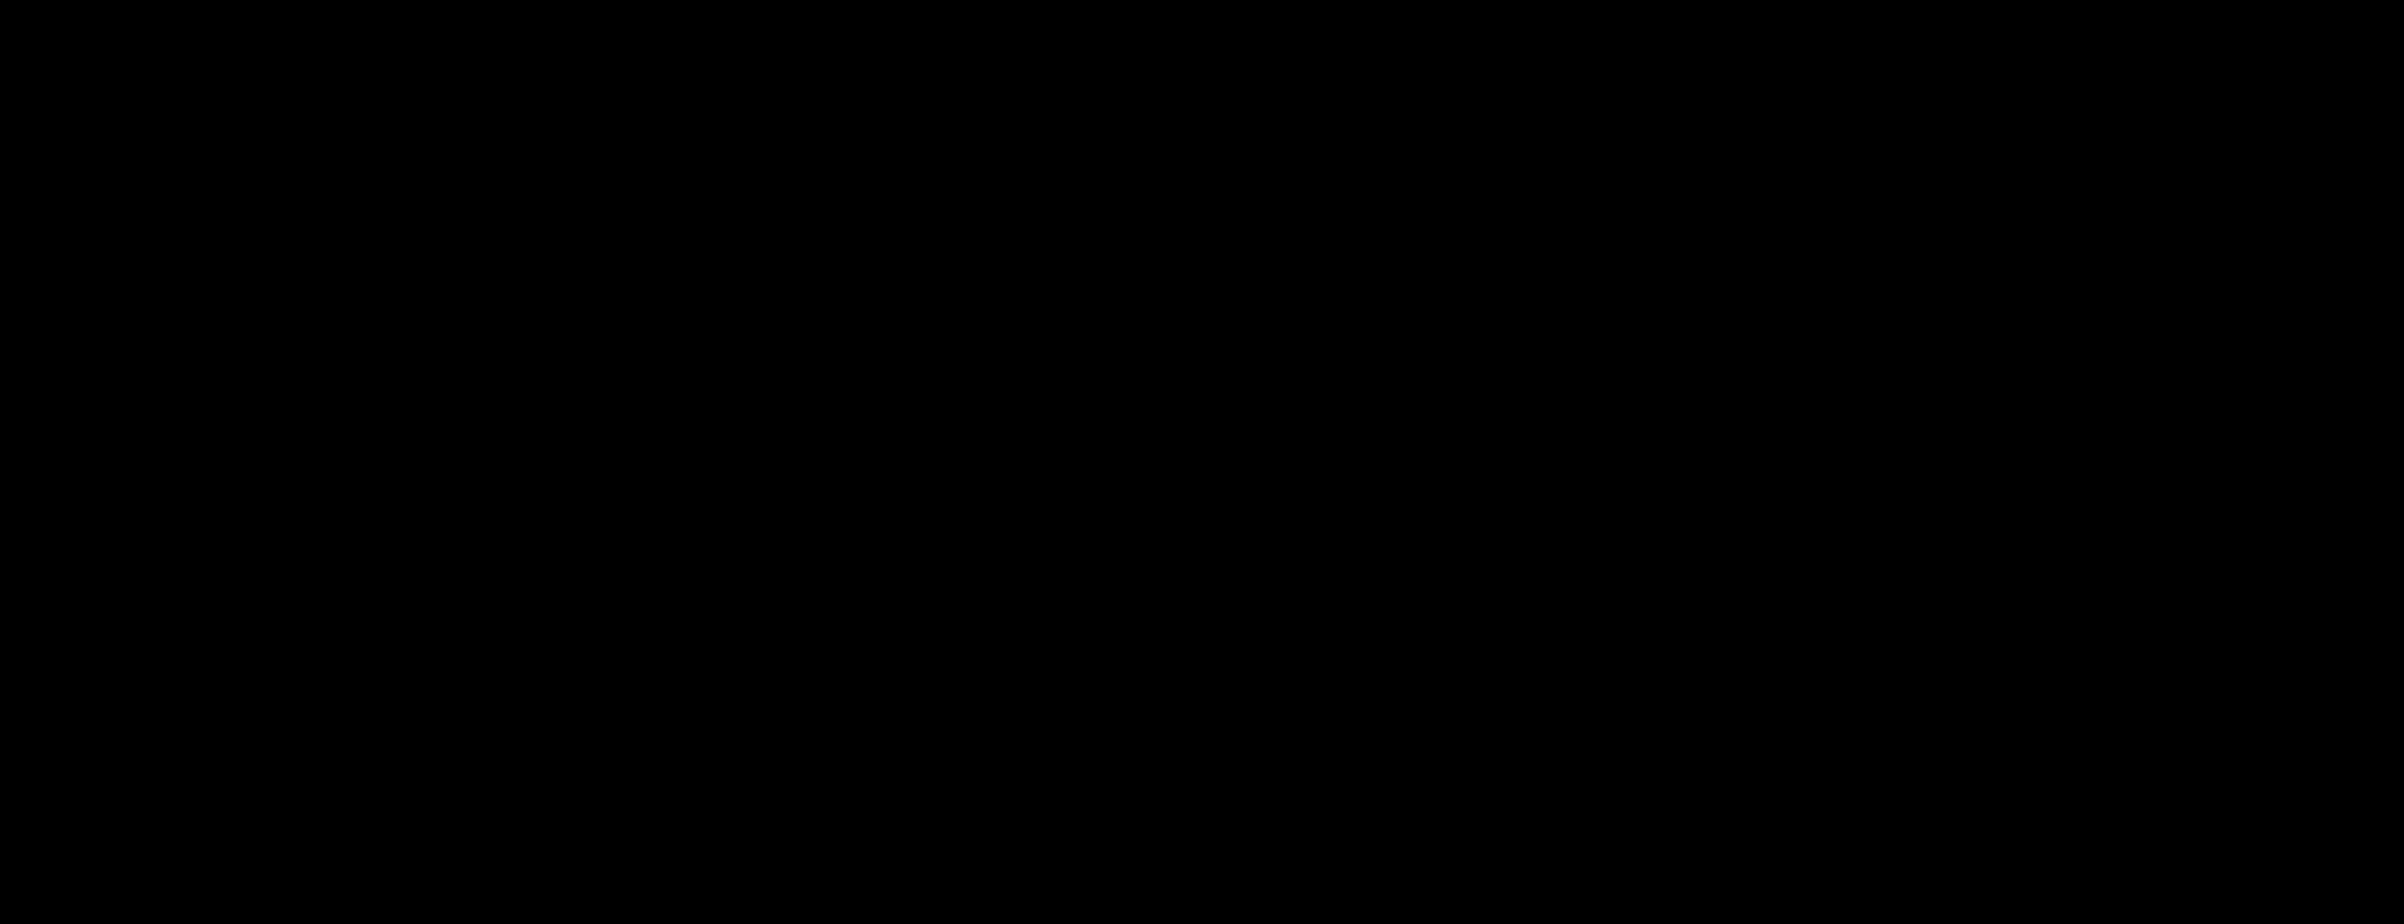 11-(Dansylamino-<sup>13</sup>C<sub>2)</sub>undecanoic acid